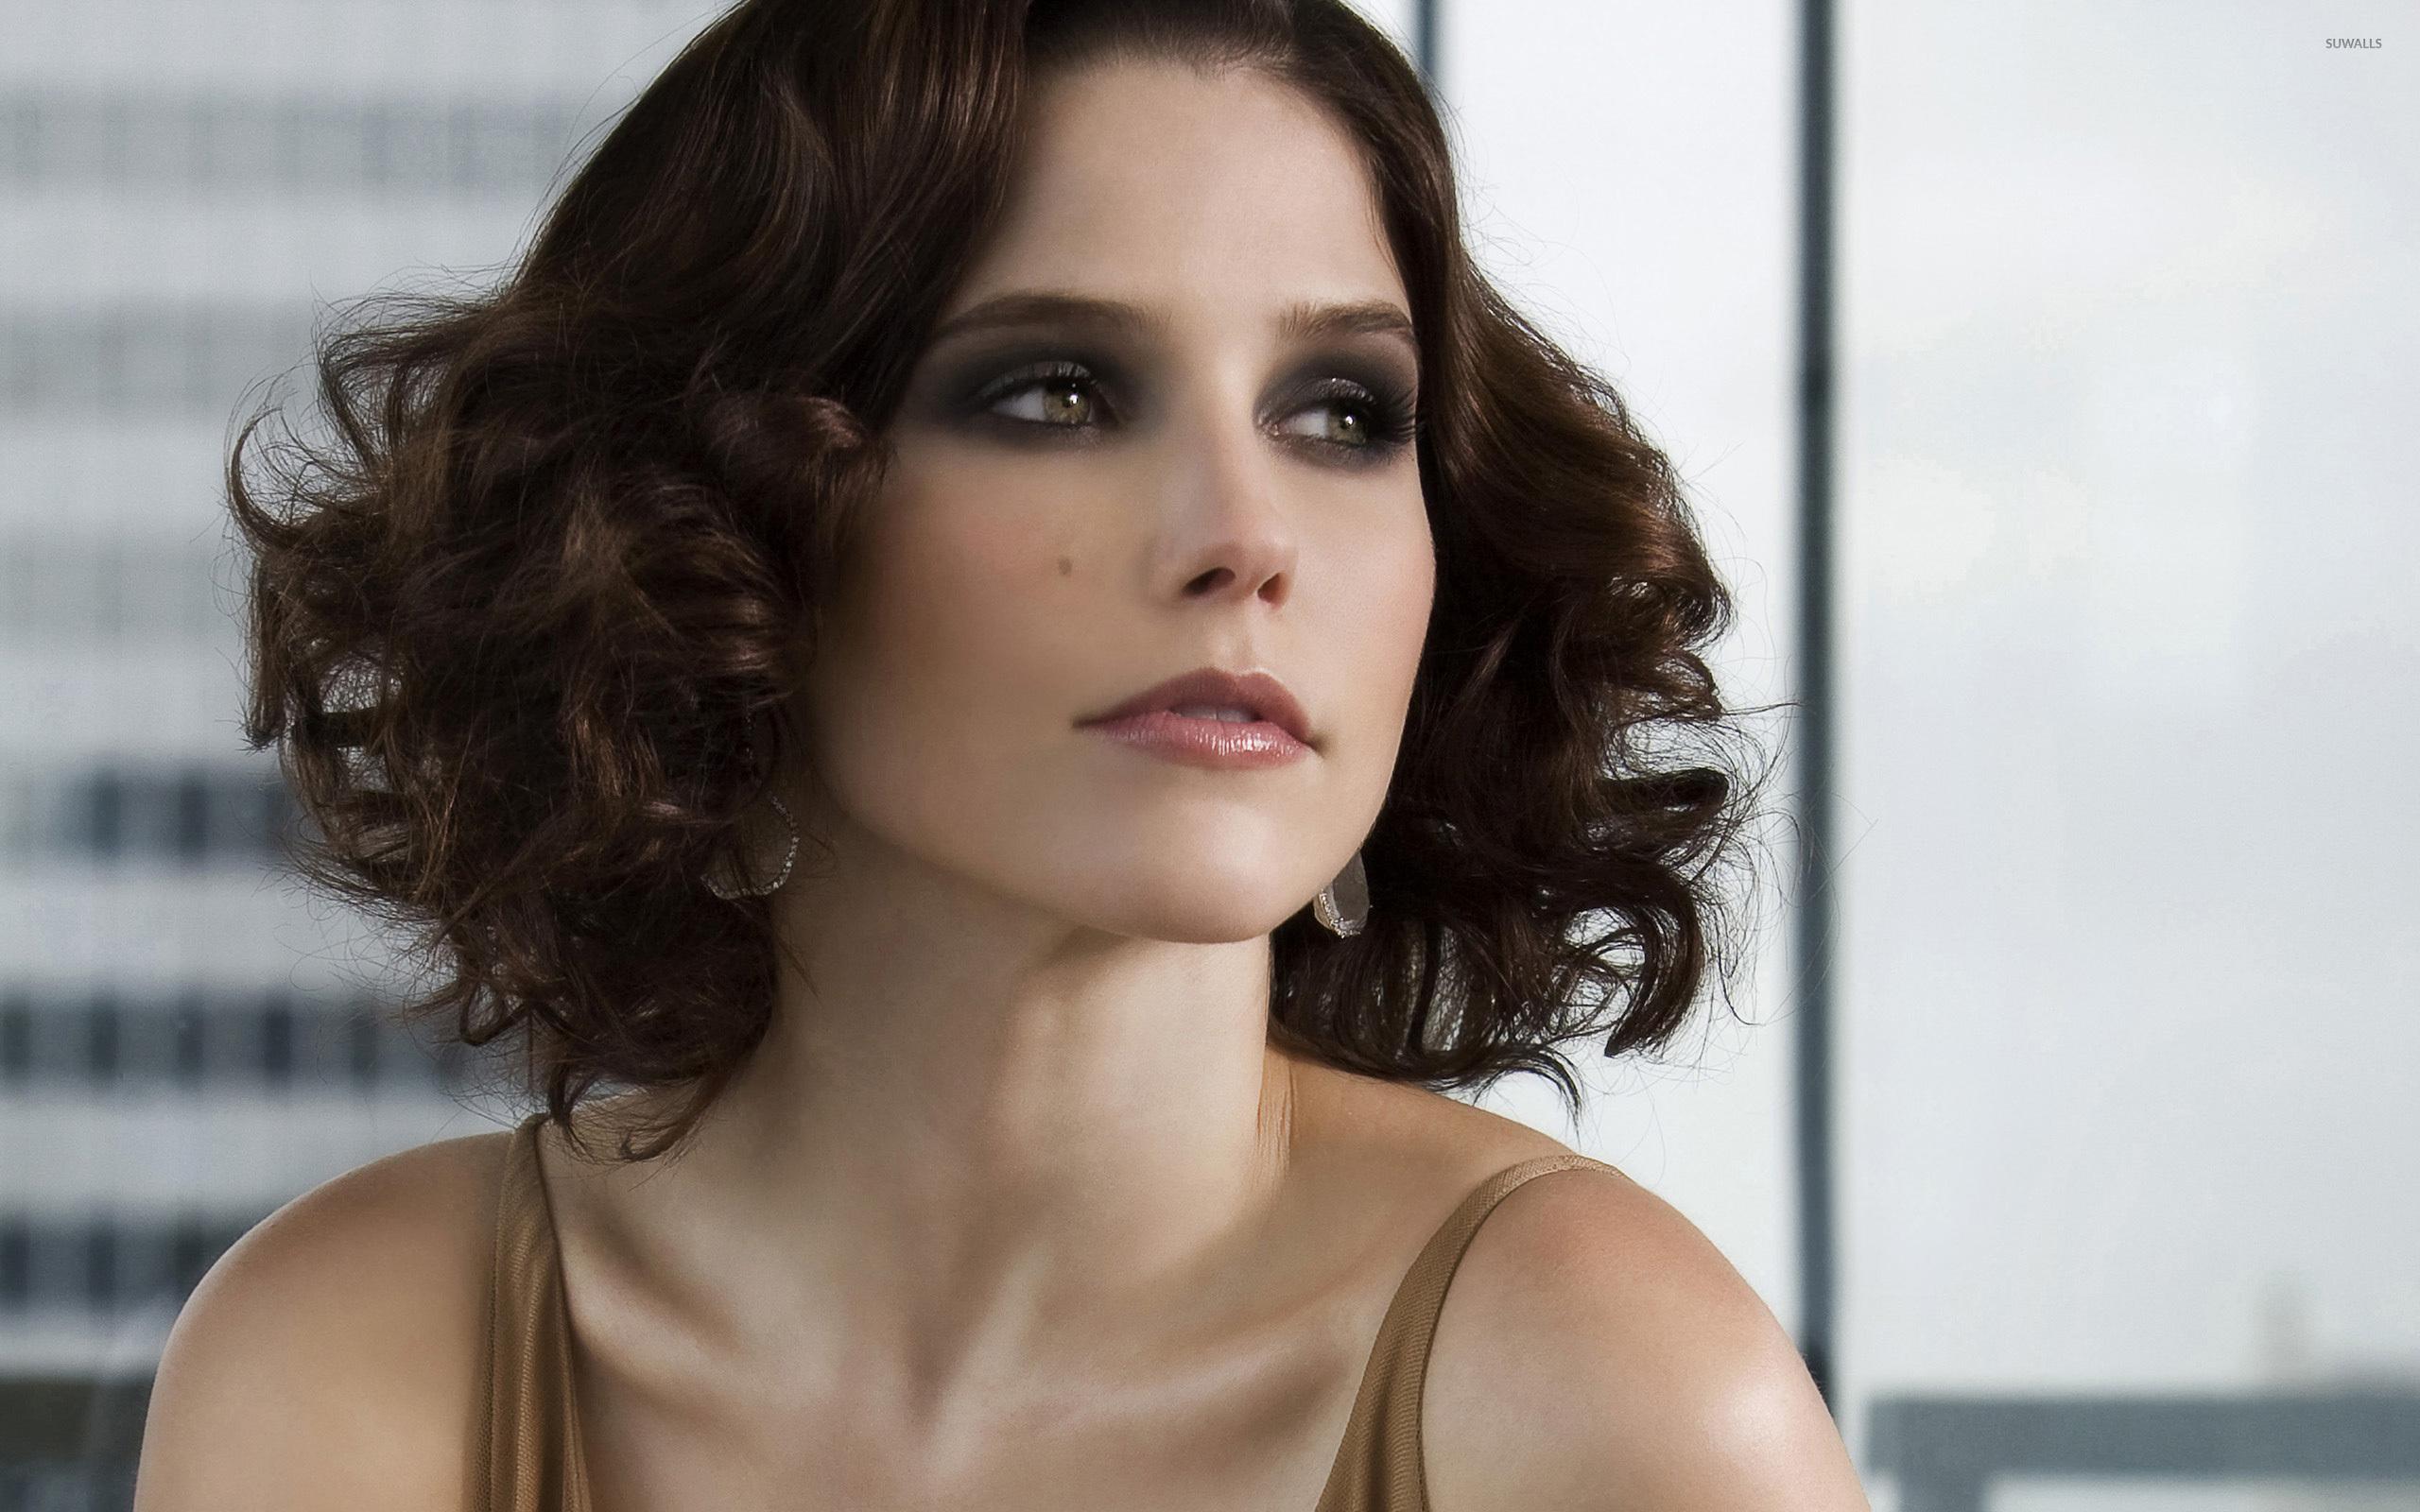 Scarlett johansson nude bush amp tits on scandalplanetcom - 3 part 1